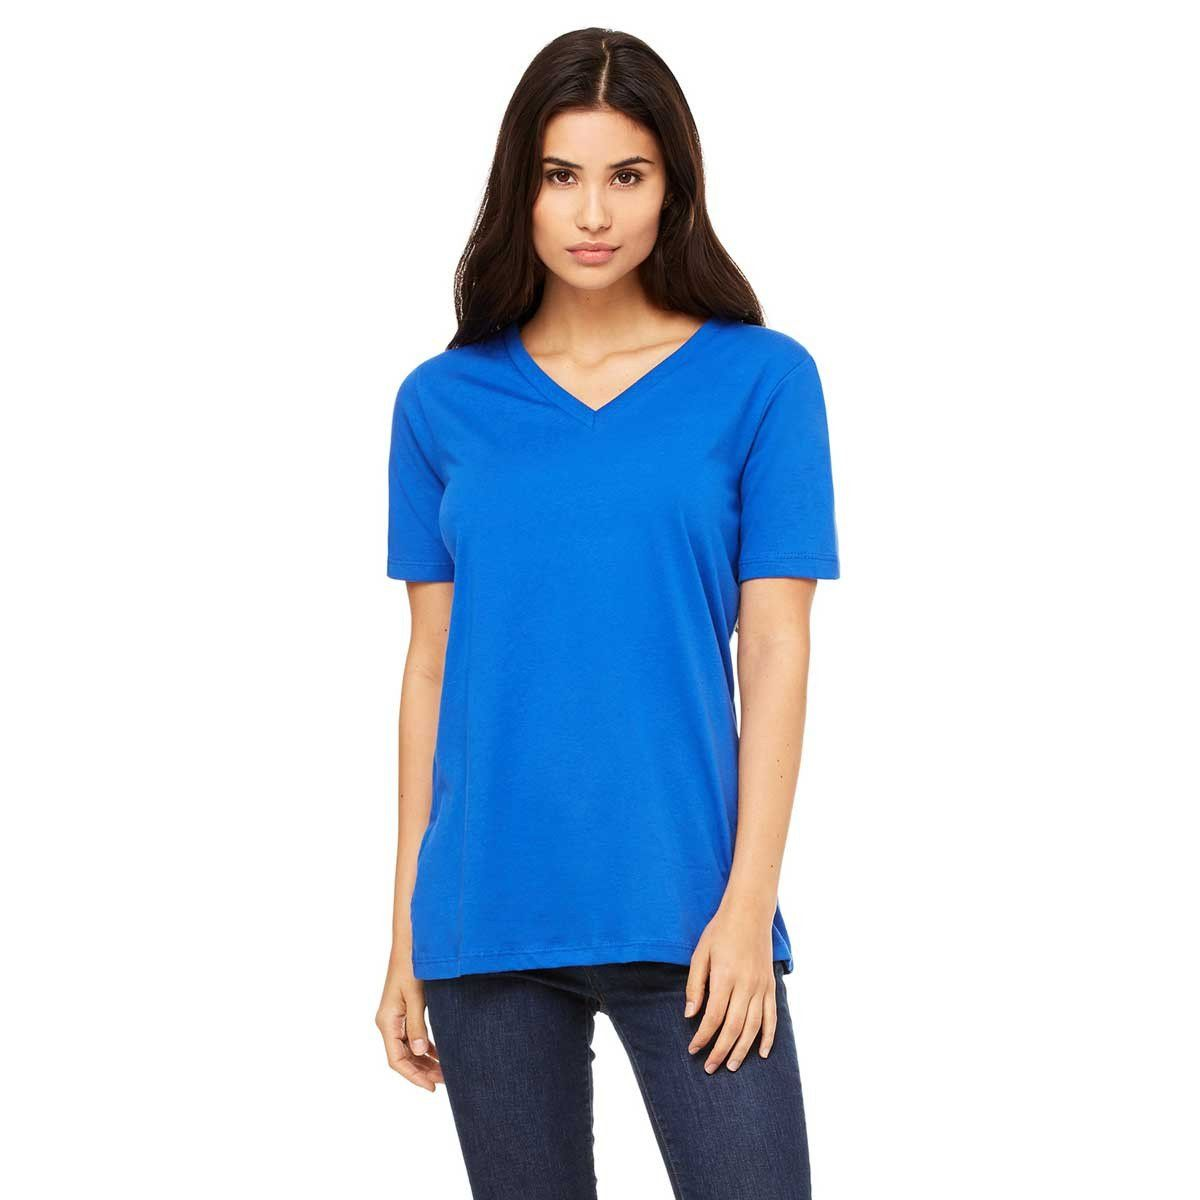 Bella + Canvas Women's True Royal Relaxed Jersey Short-Sleeve V-Neck T-Shirt